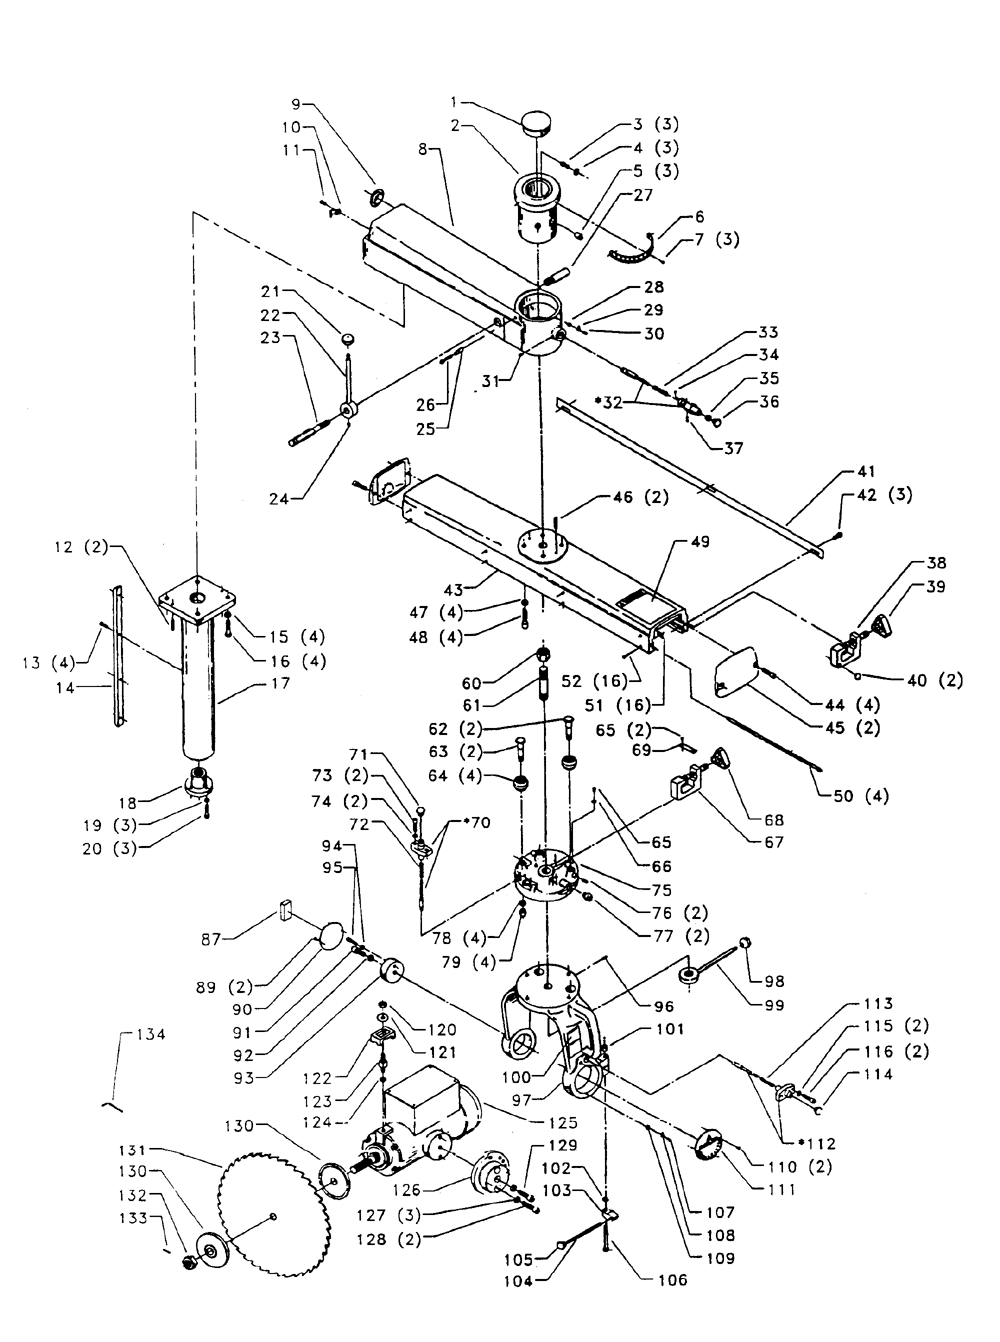 Buy Delta 33-420 Type-1 5 HP, 18 Inch Radial Arm (230